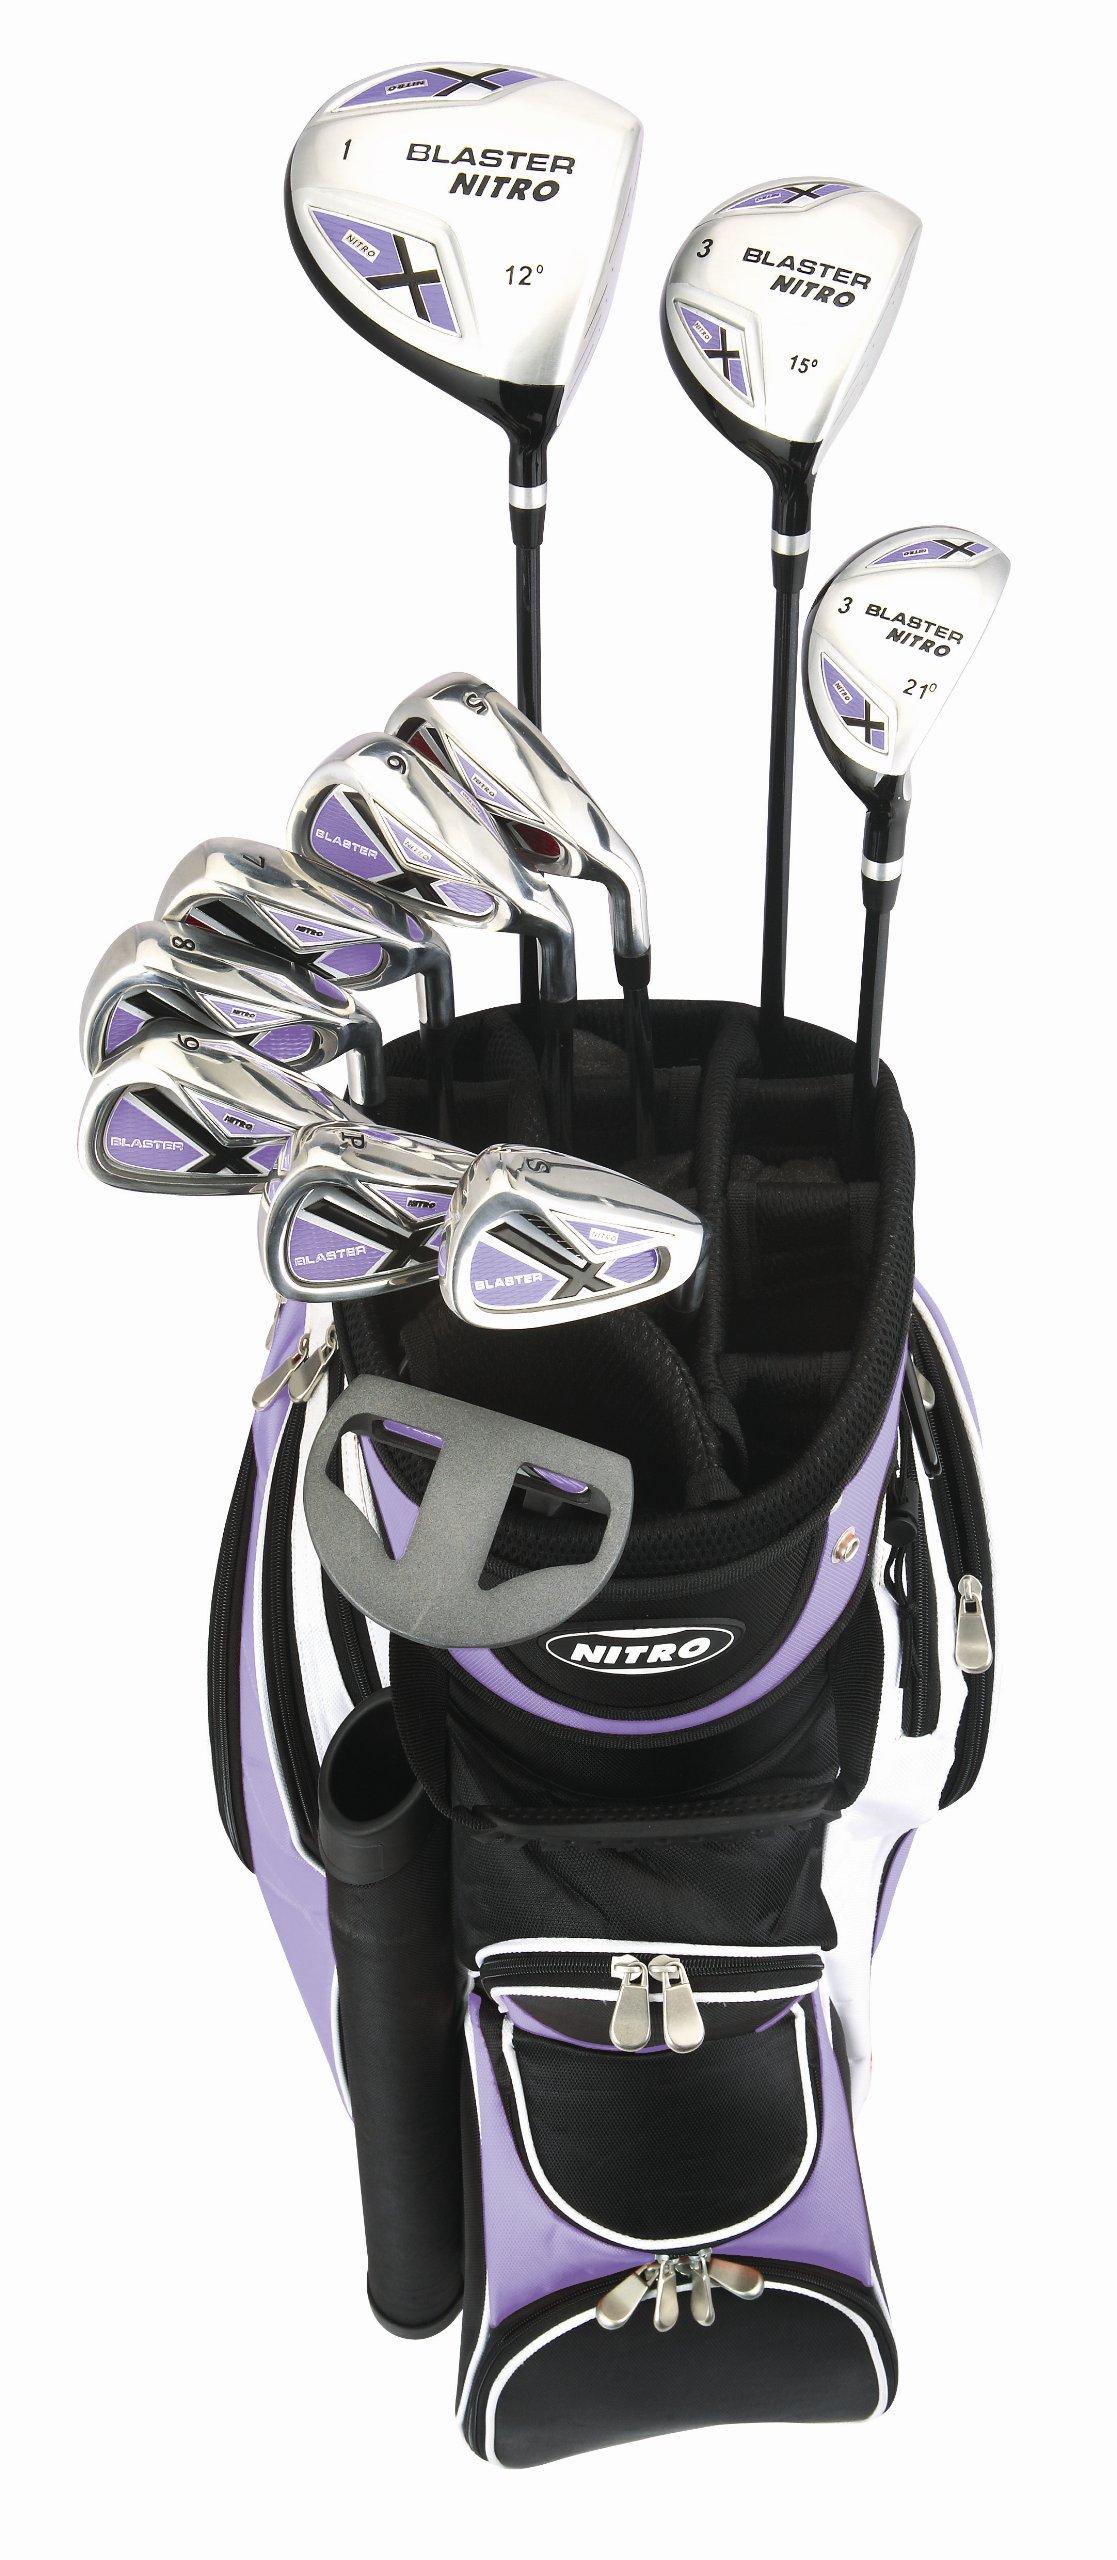 Nitro Women's Blaster Golf Set (15-Piece) by Nitro (Image #1)